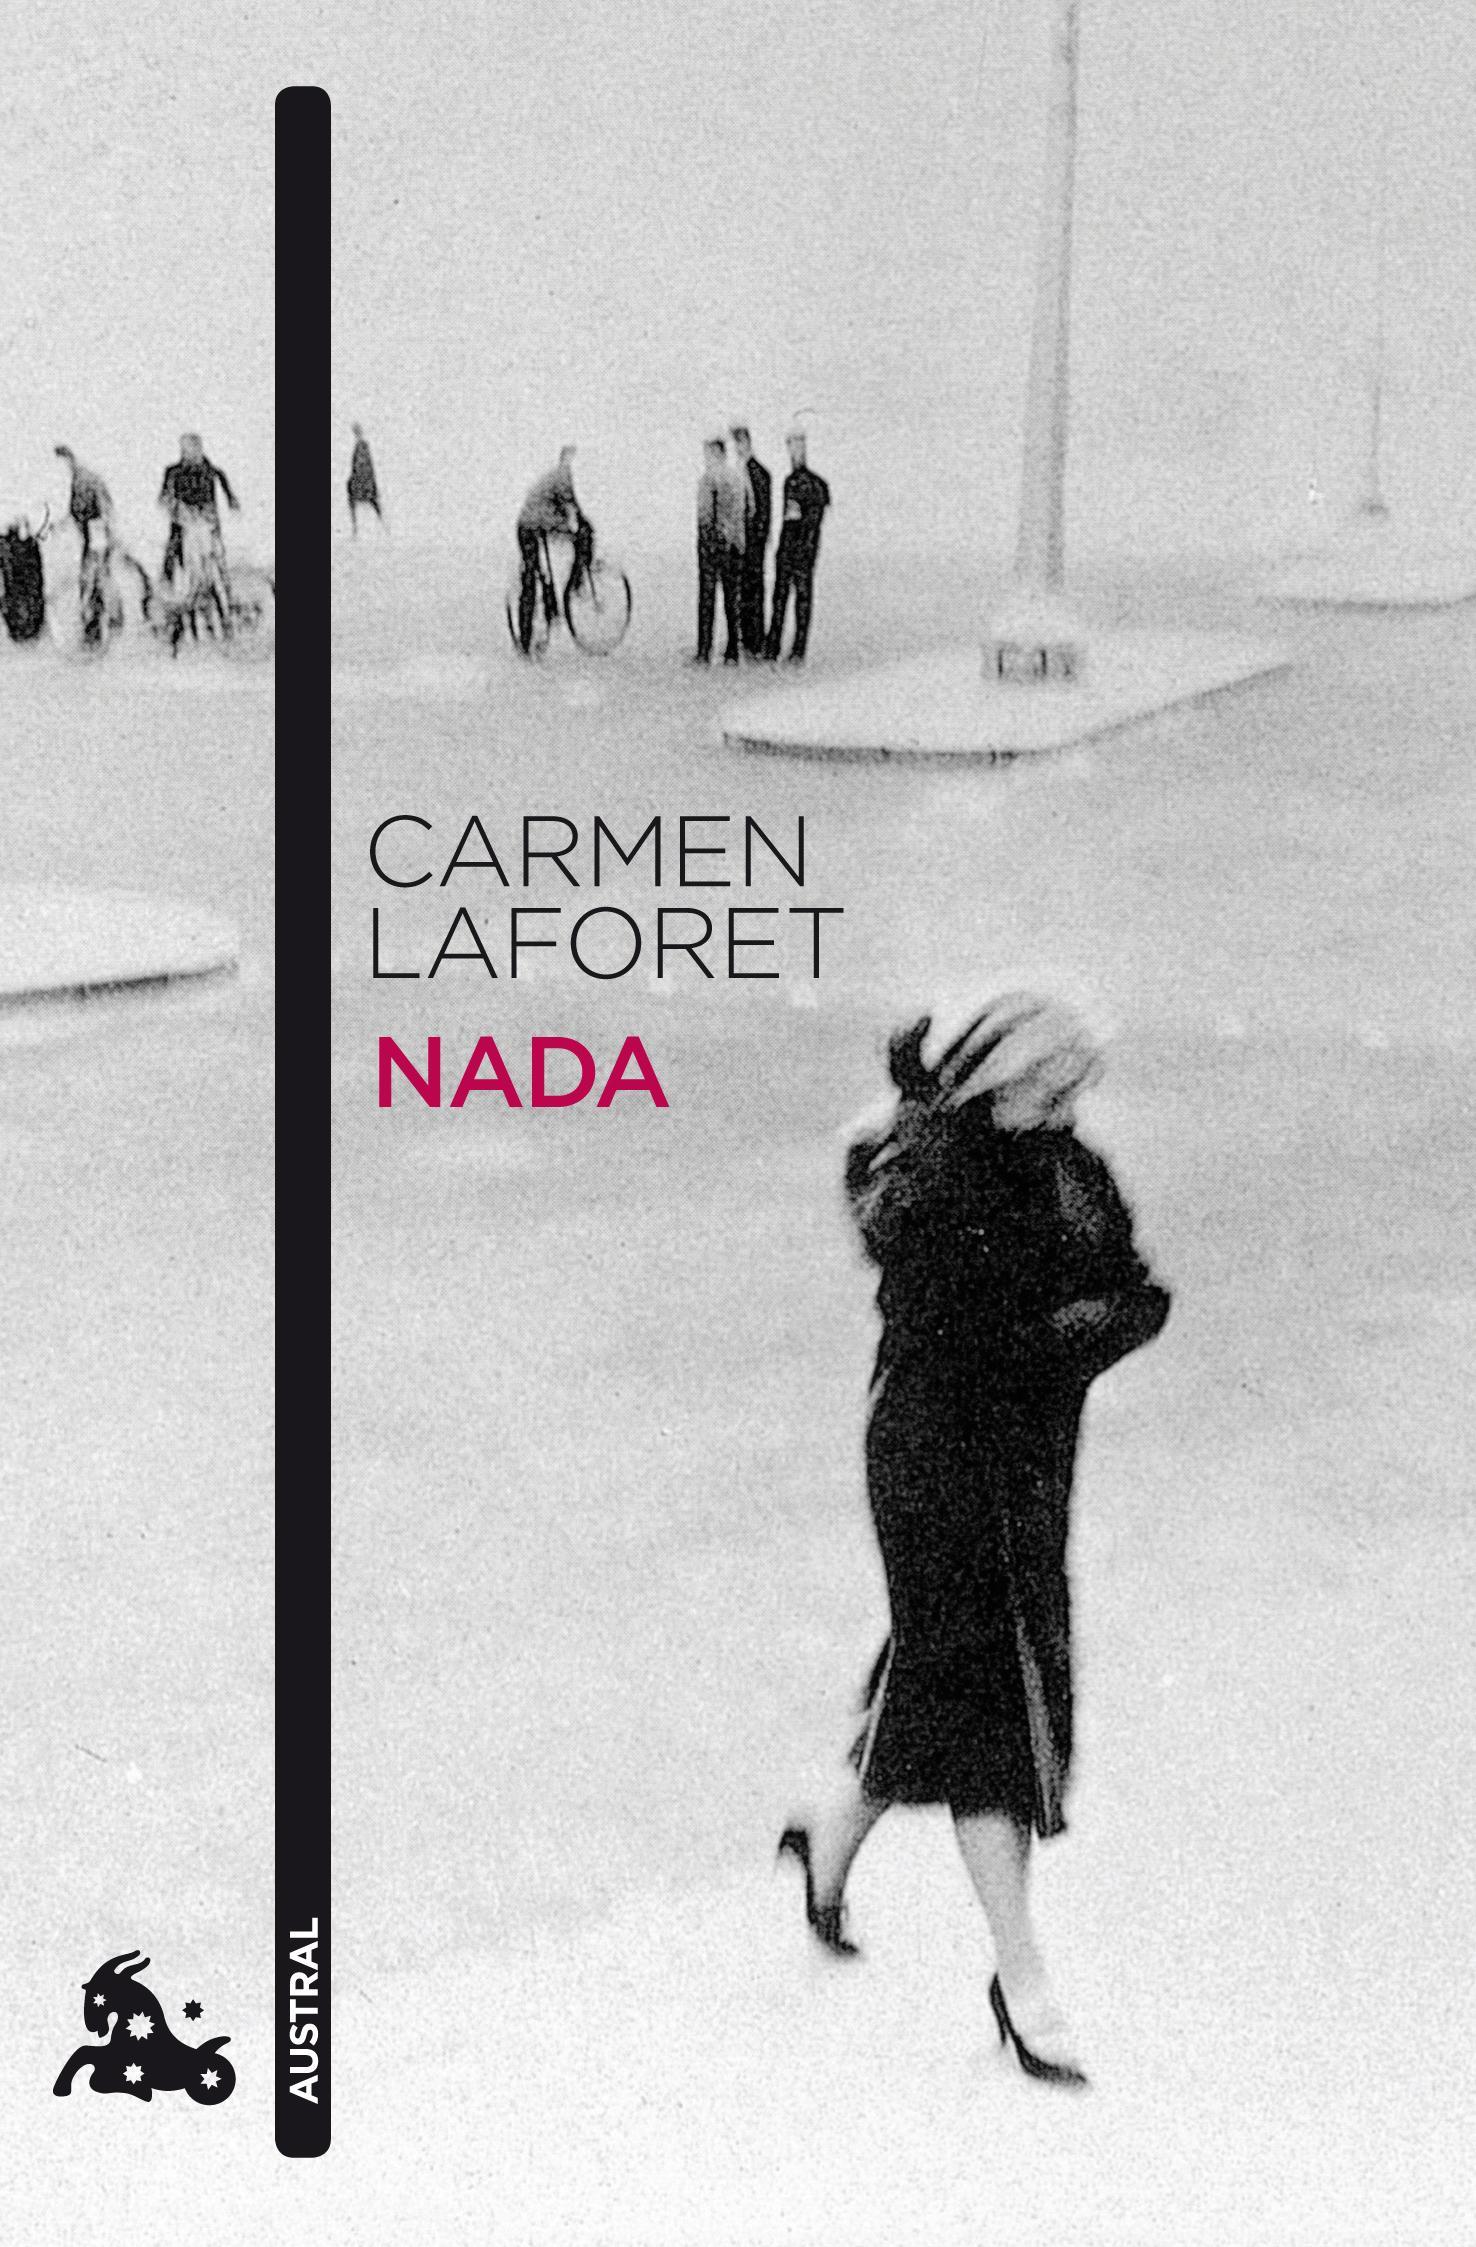 26. Nada de Carmen Laforet